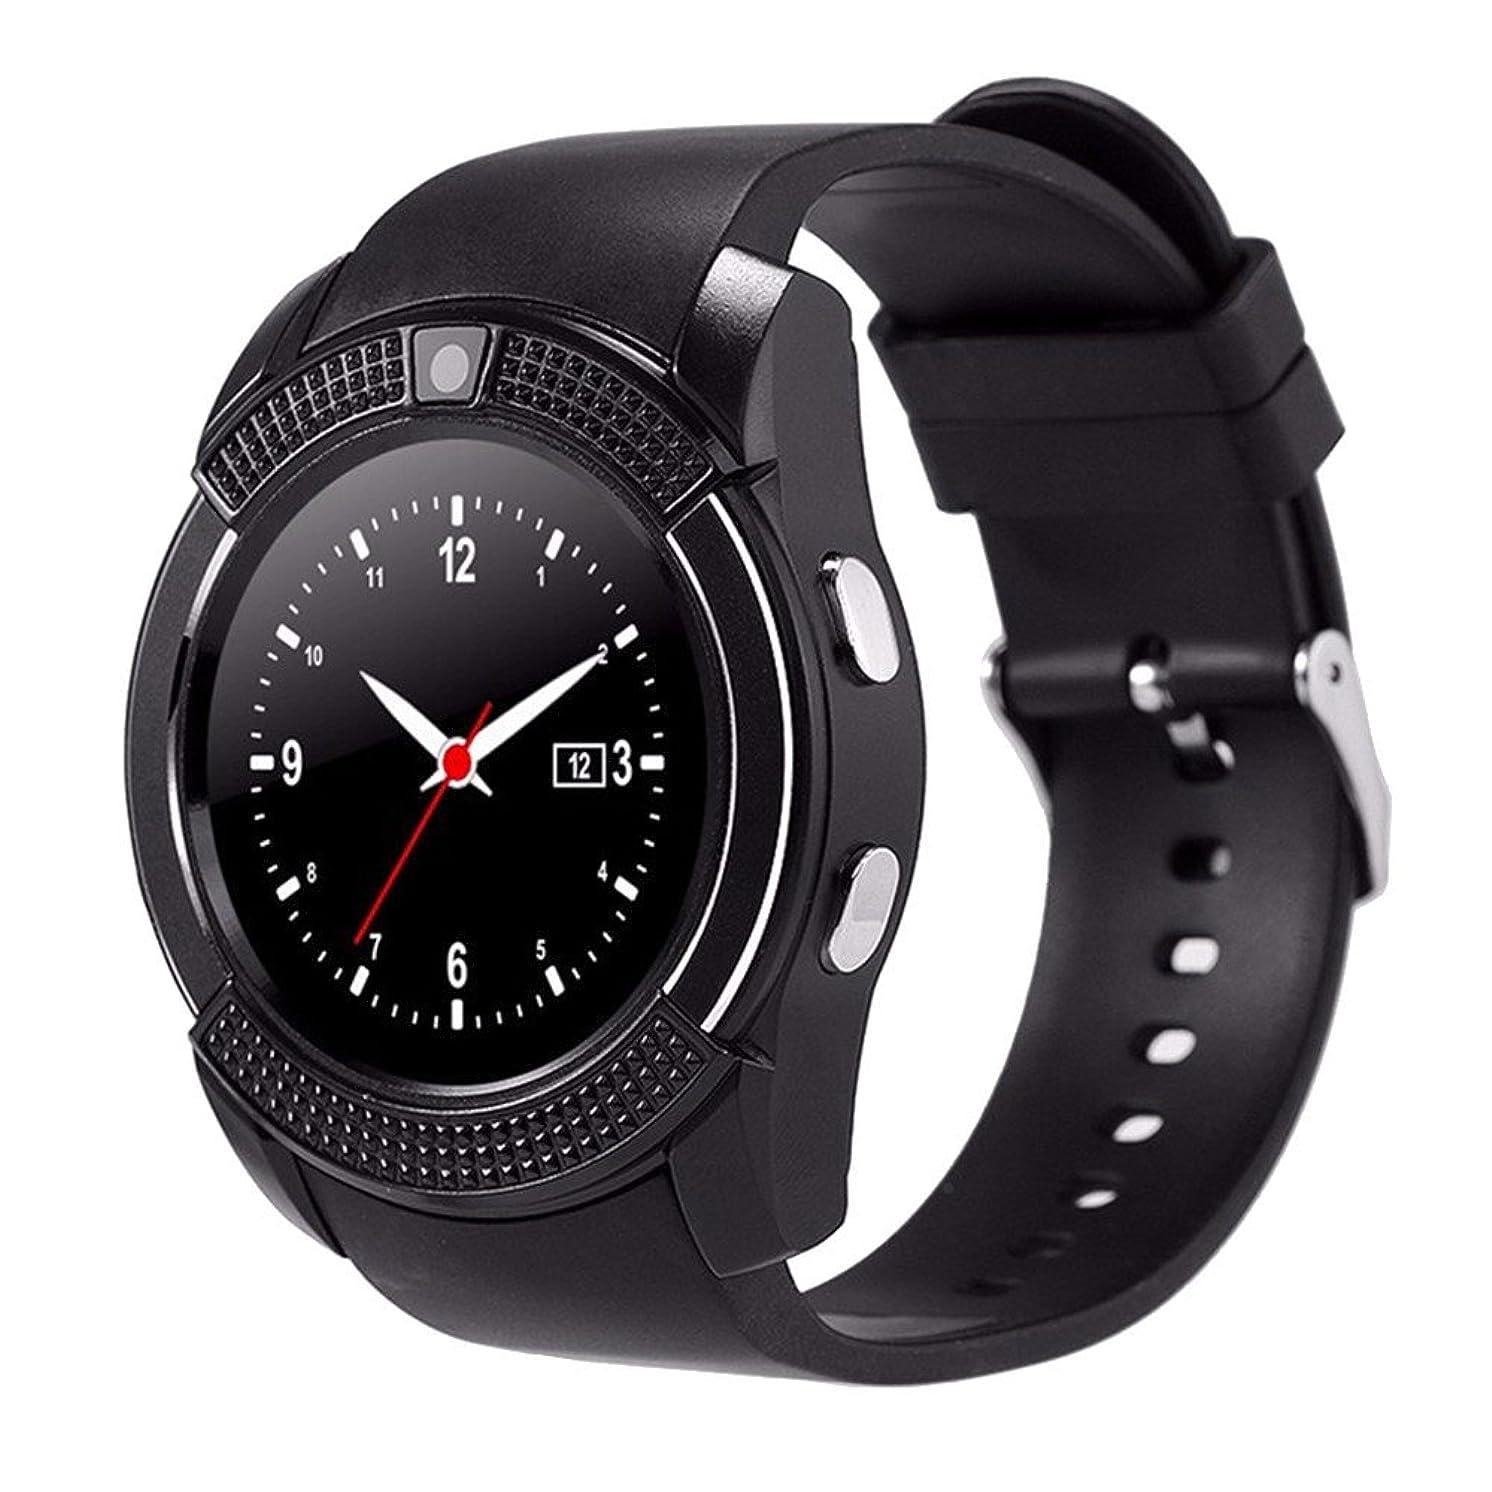 ZOMTOP V8 Sport Bluetooth Round Dial Wrist Smart Watch Camera SIM TF Slot for iOS Android Fashion(Black)